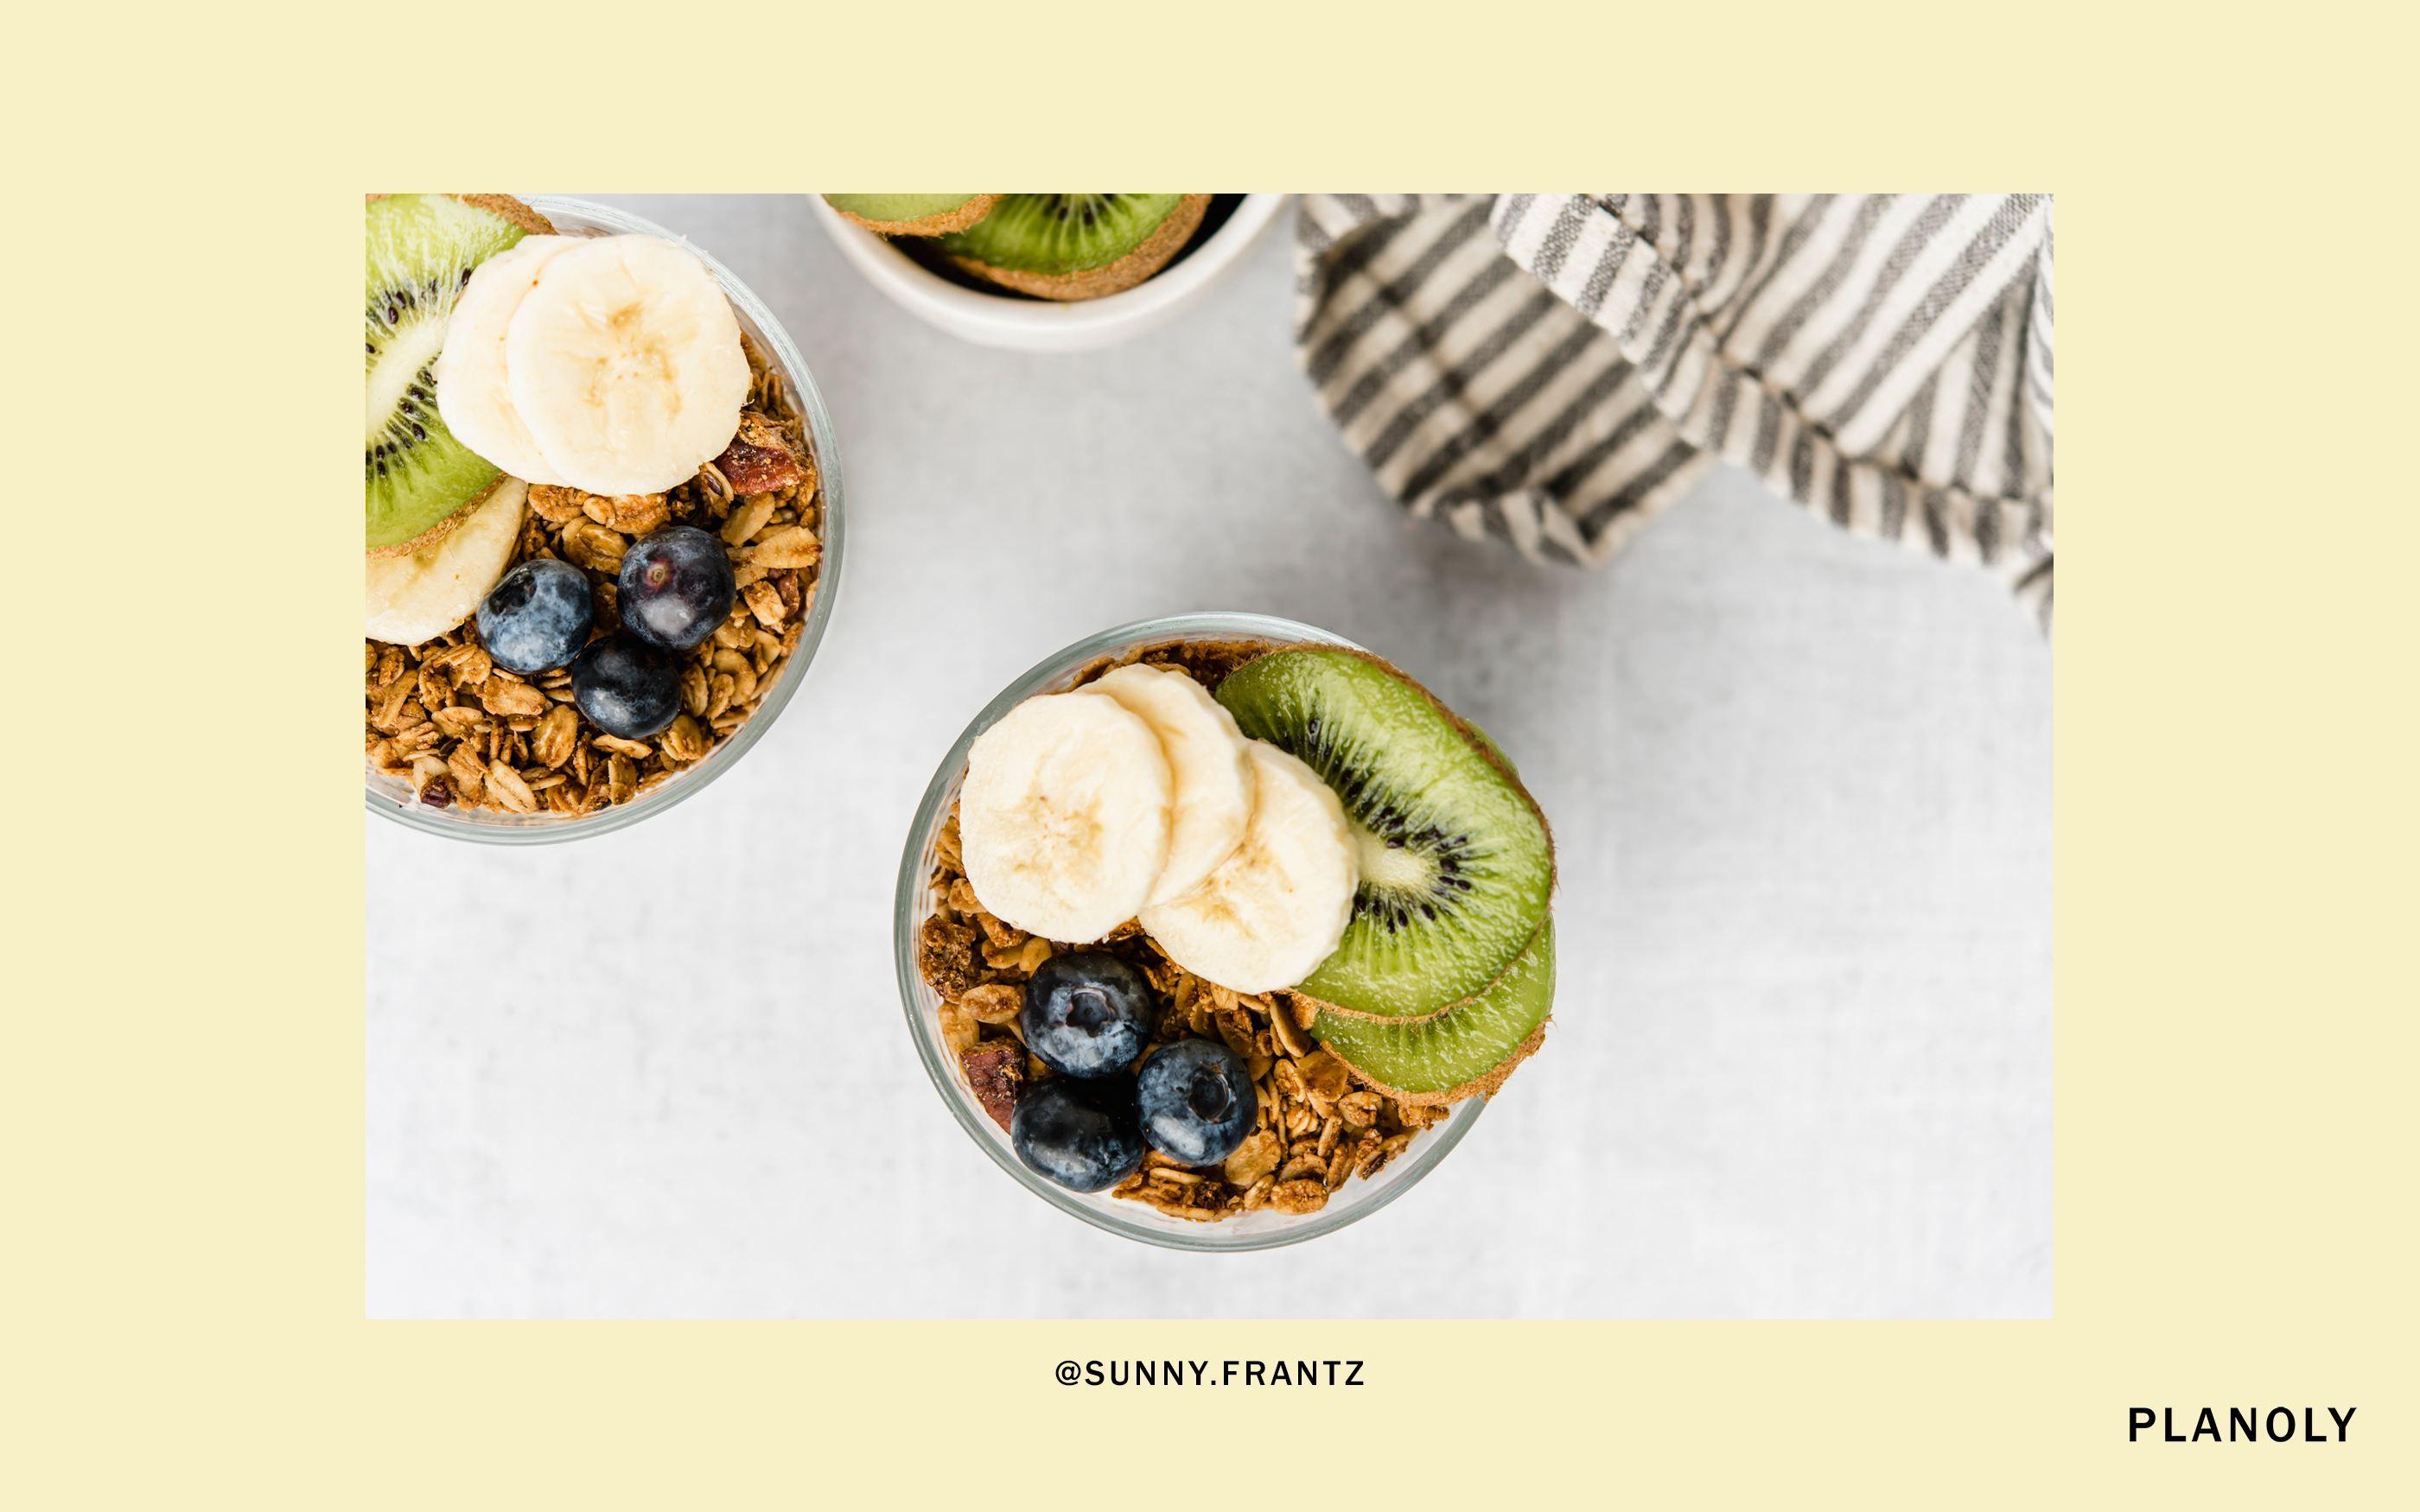 PLANOLY - Blog Post - Food Styling Tips - Sunny Frantz - Image 2